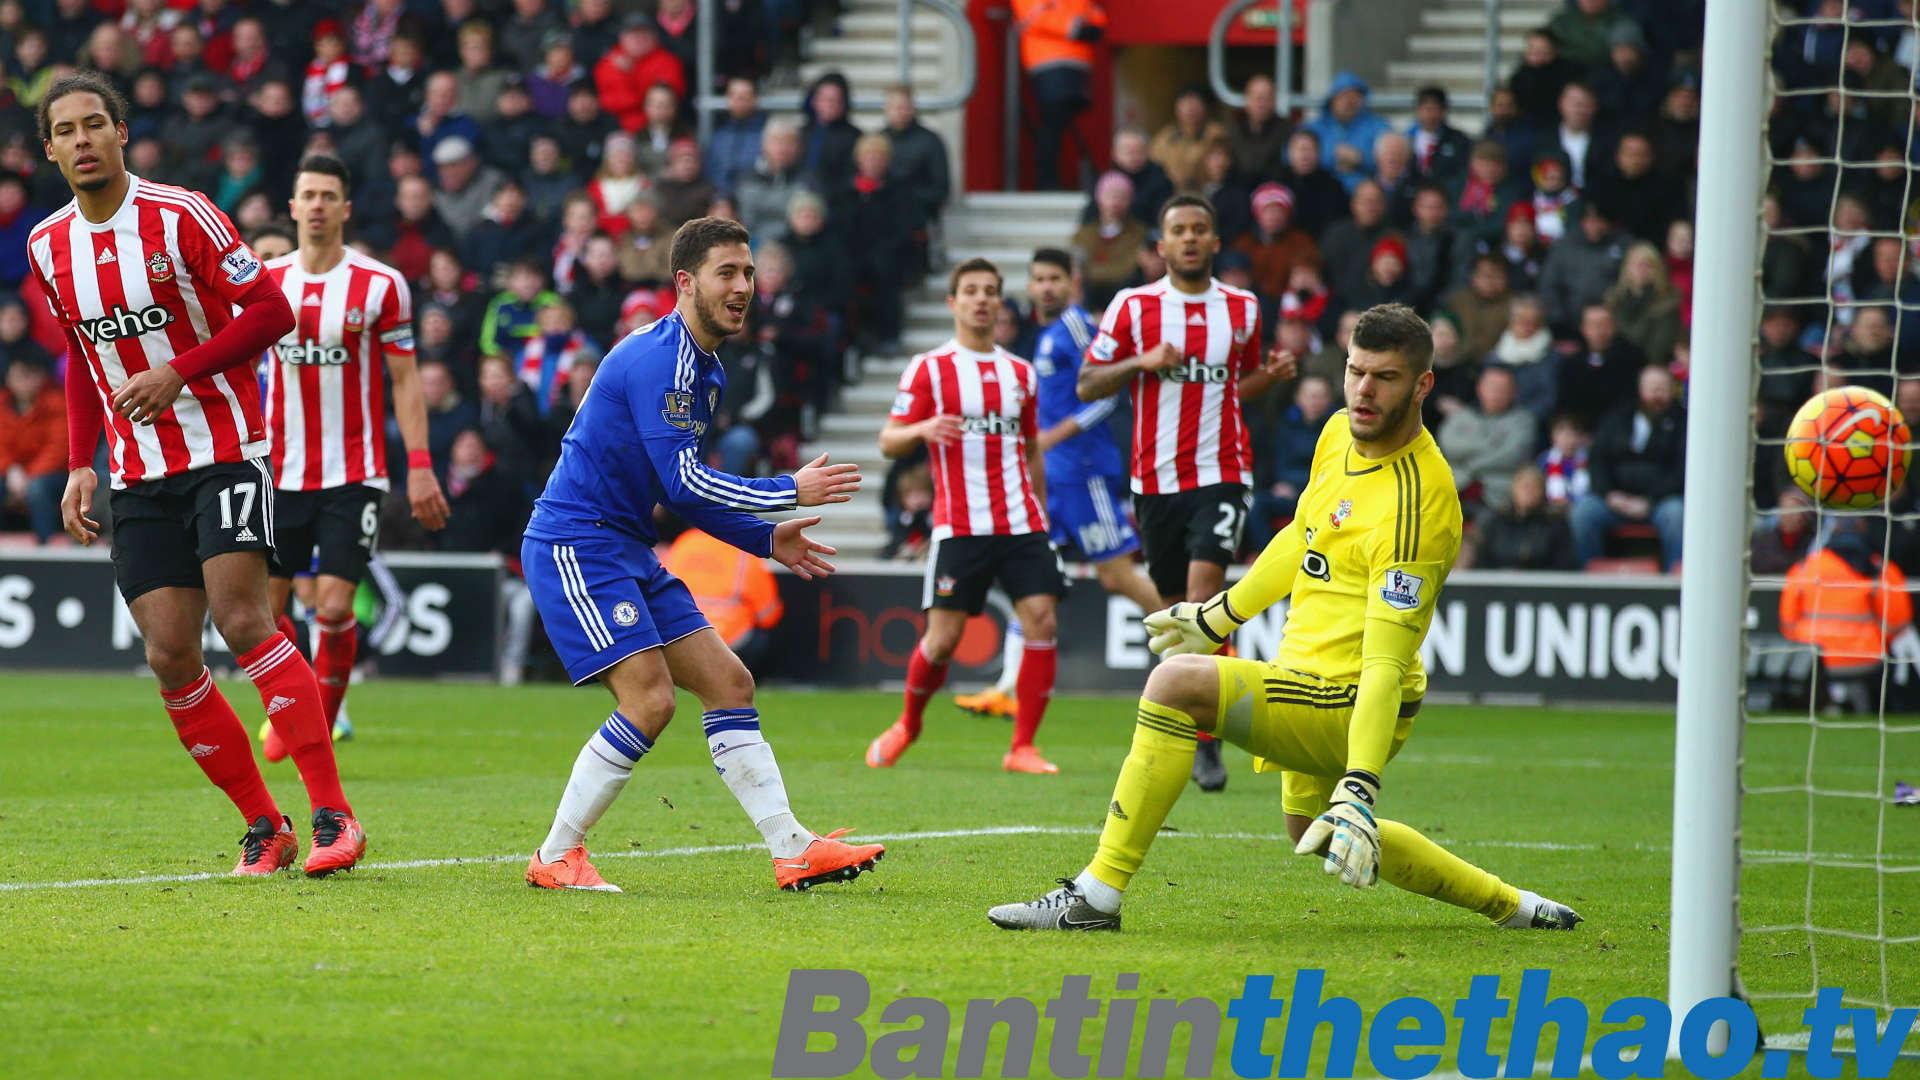 Chelsea vs Southampton tối nay 22/4/2018 Bán kết FA Cup